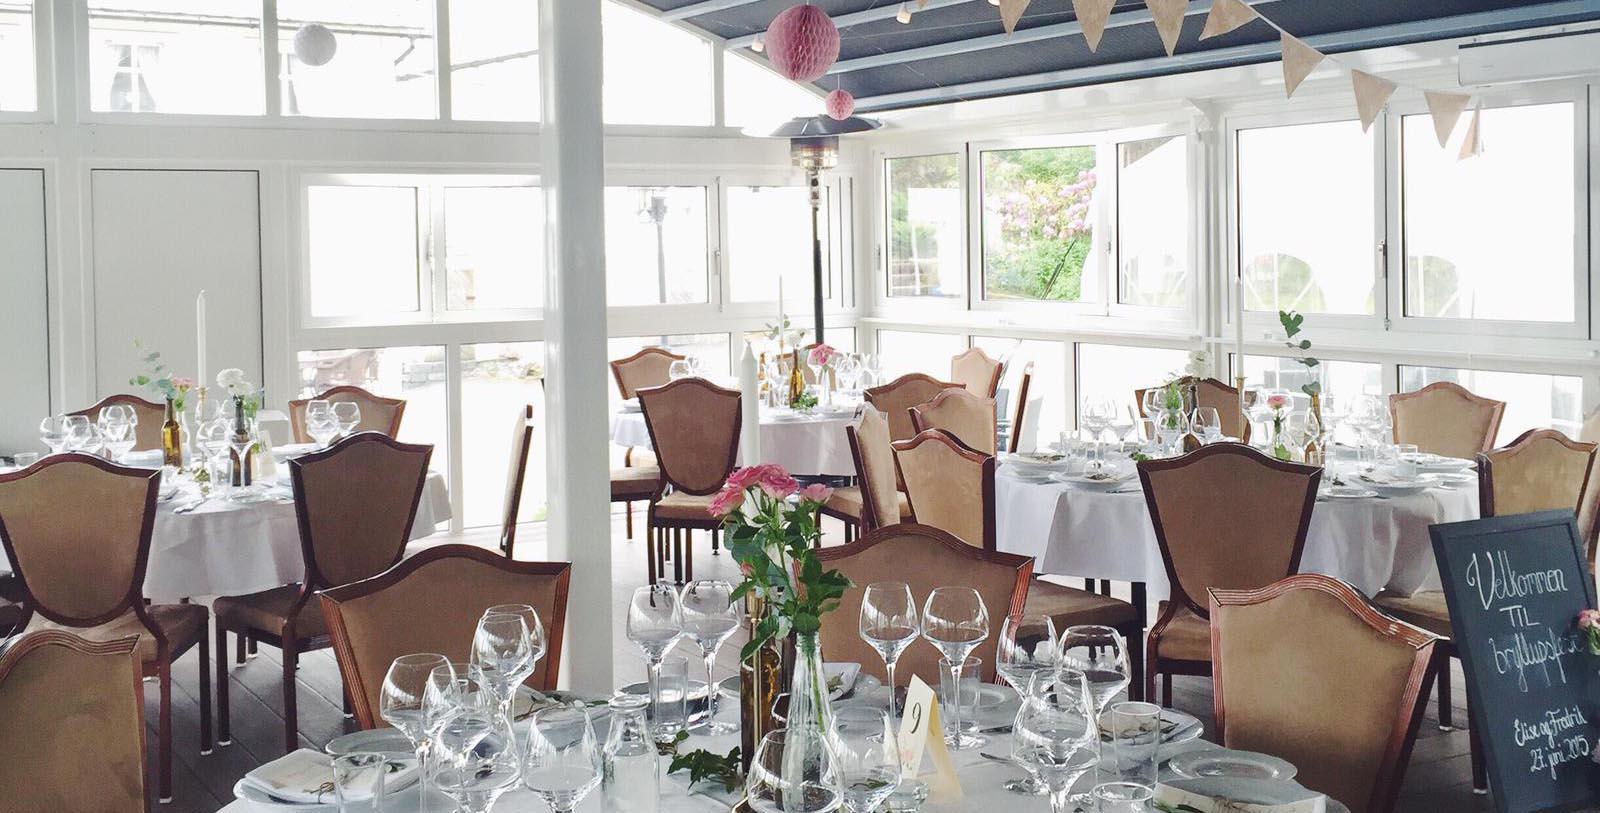 Image of restaurant Bekkjarvik Gjestgiveri, 1700s, Member of Historic Hotels Worldwide, in Norway, Taste